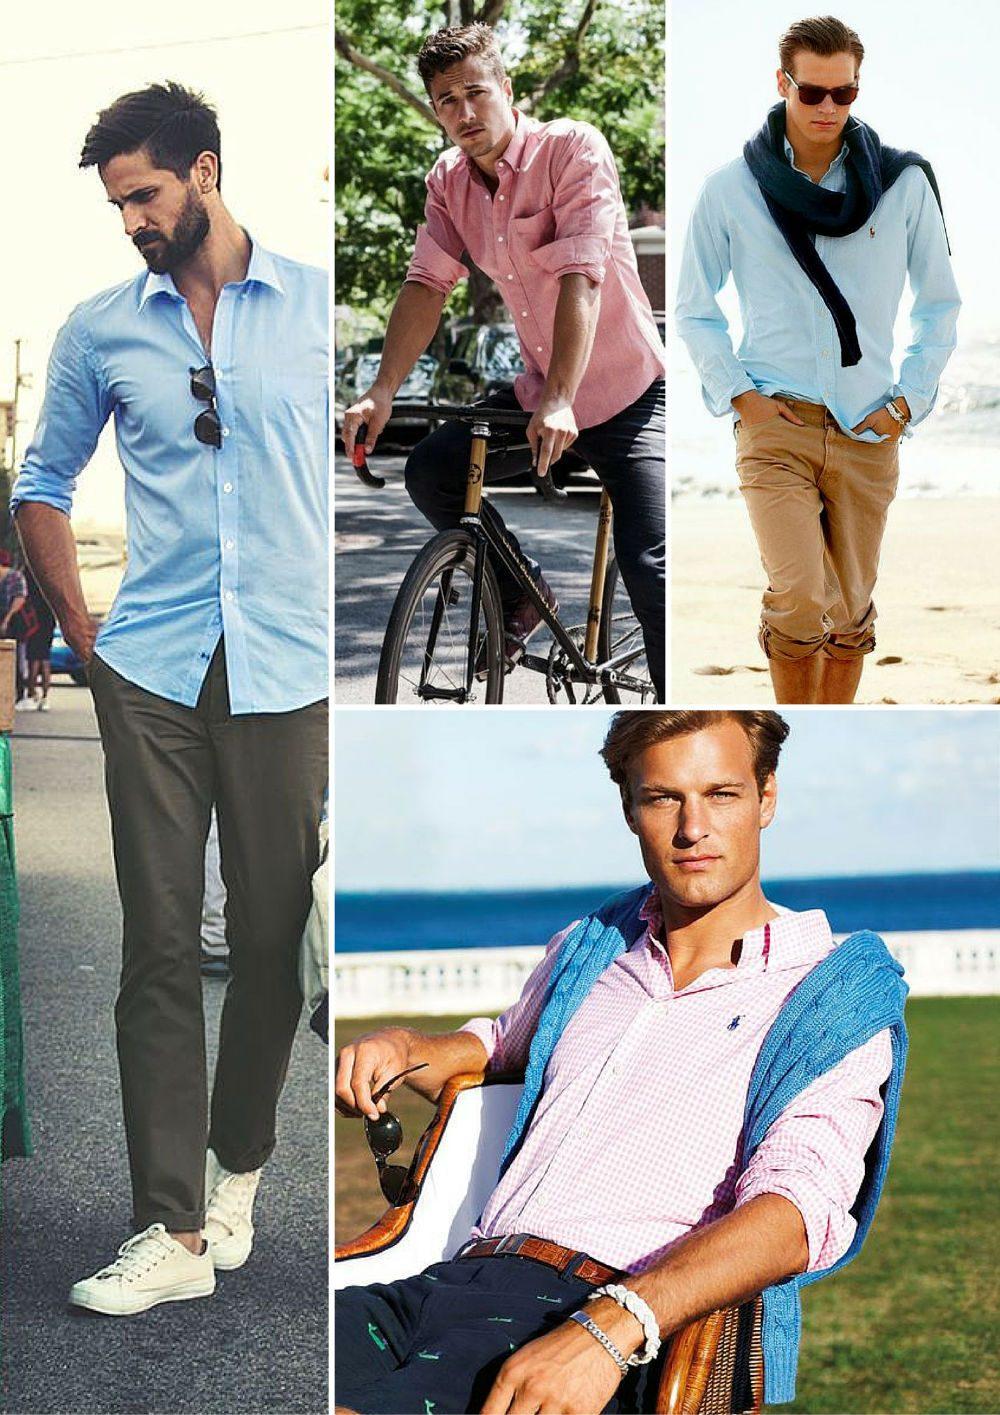 olika typer av skjortor avslappnad skjorta